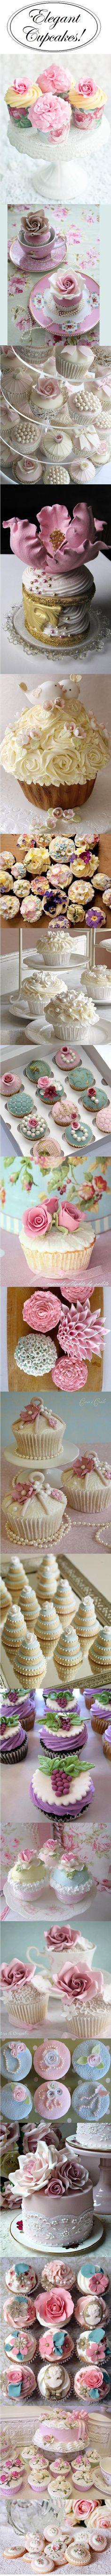 dessert tables, cupcakes, wedding desserts, cupcak full, cup cake